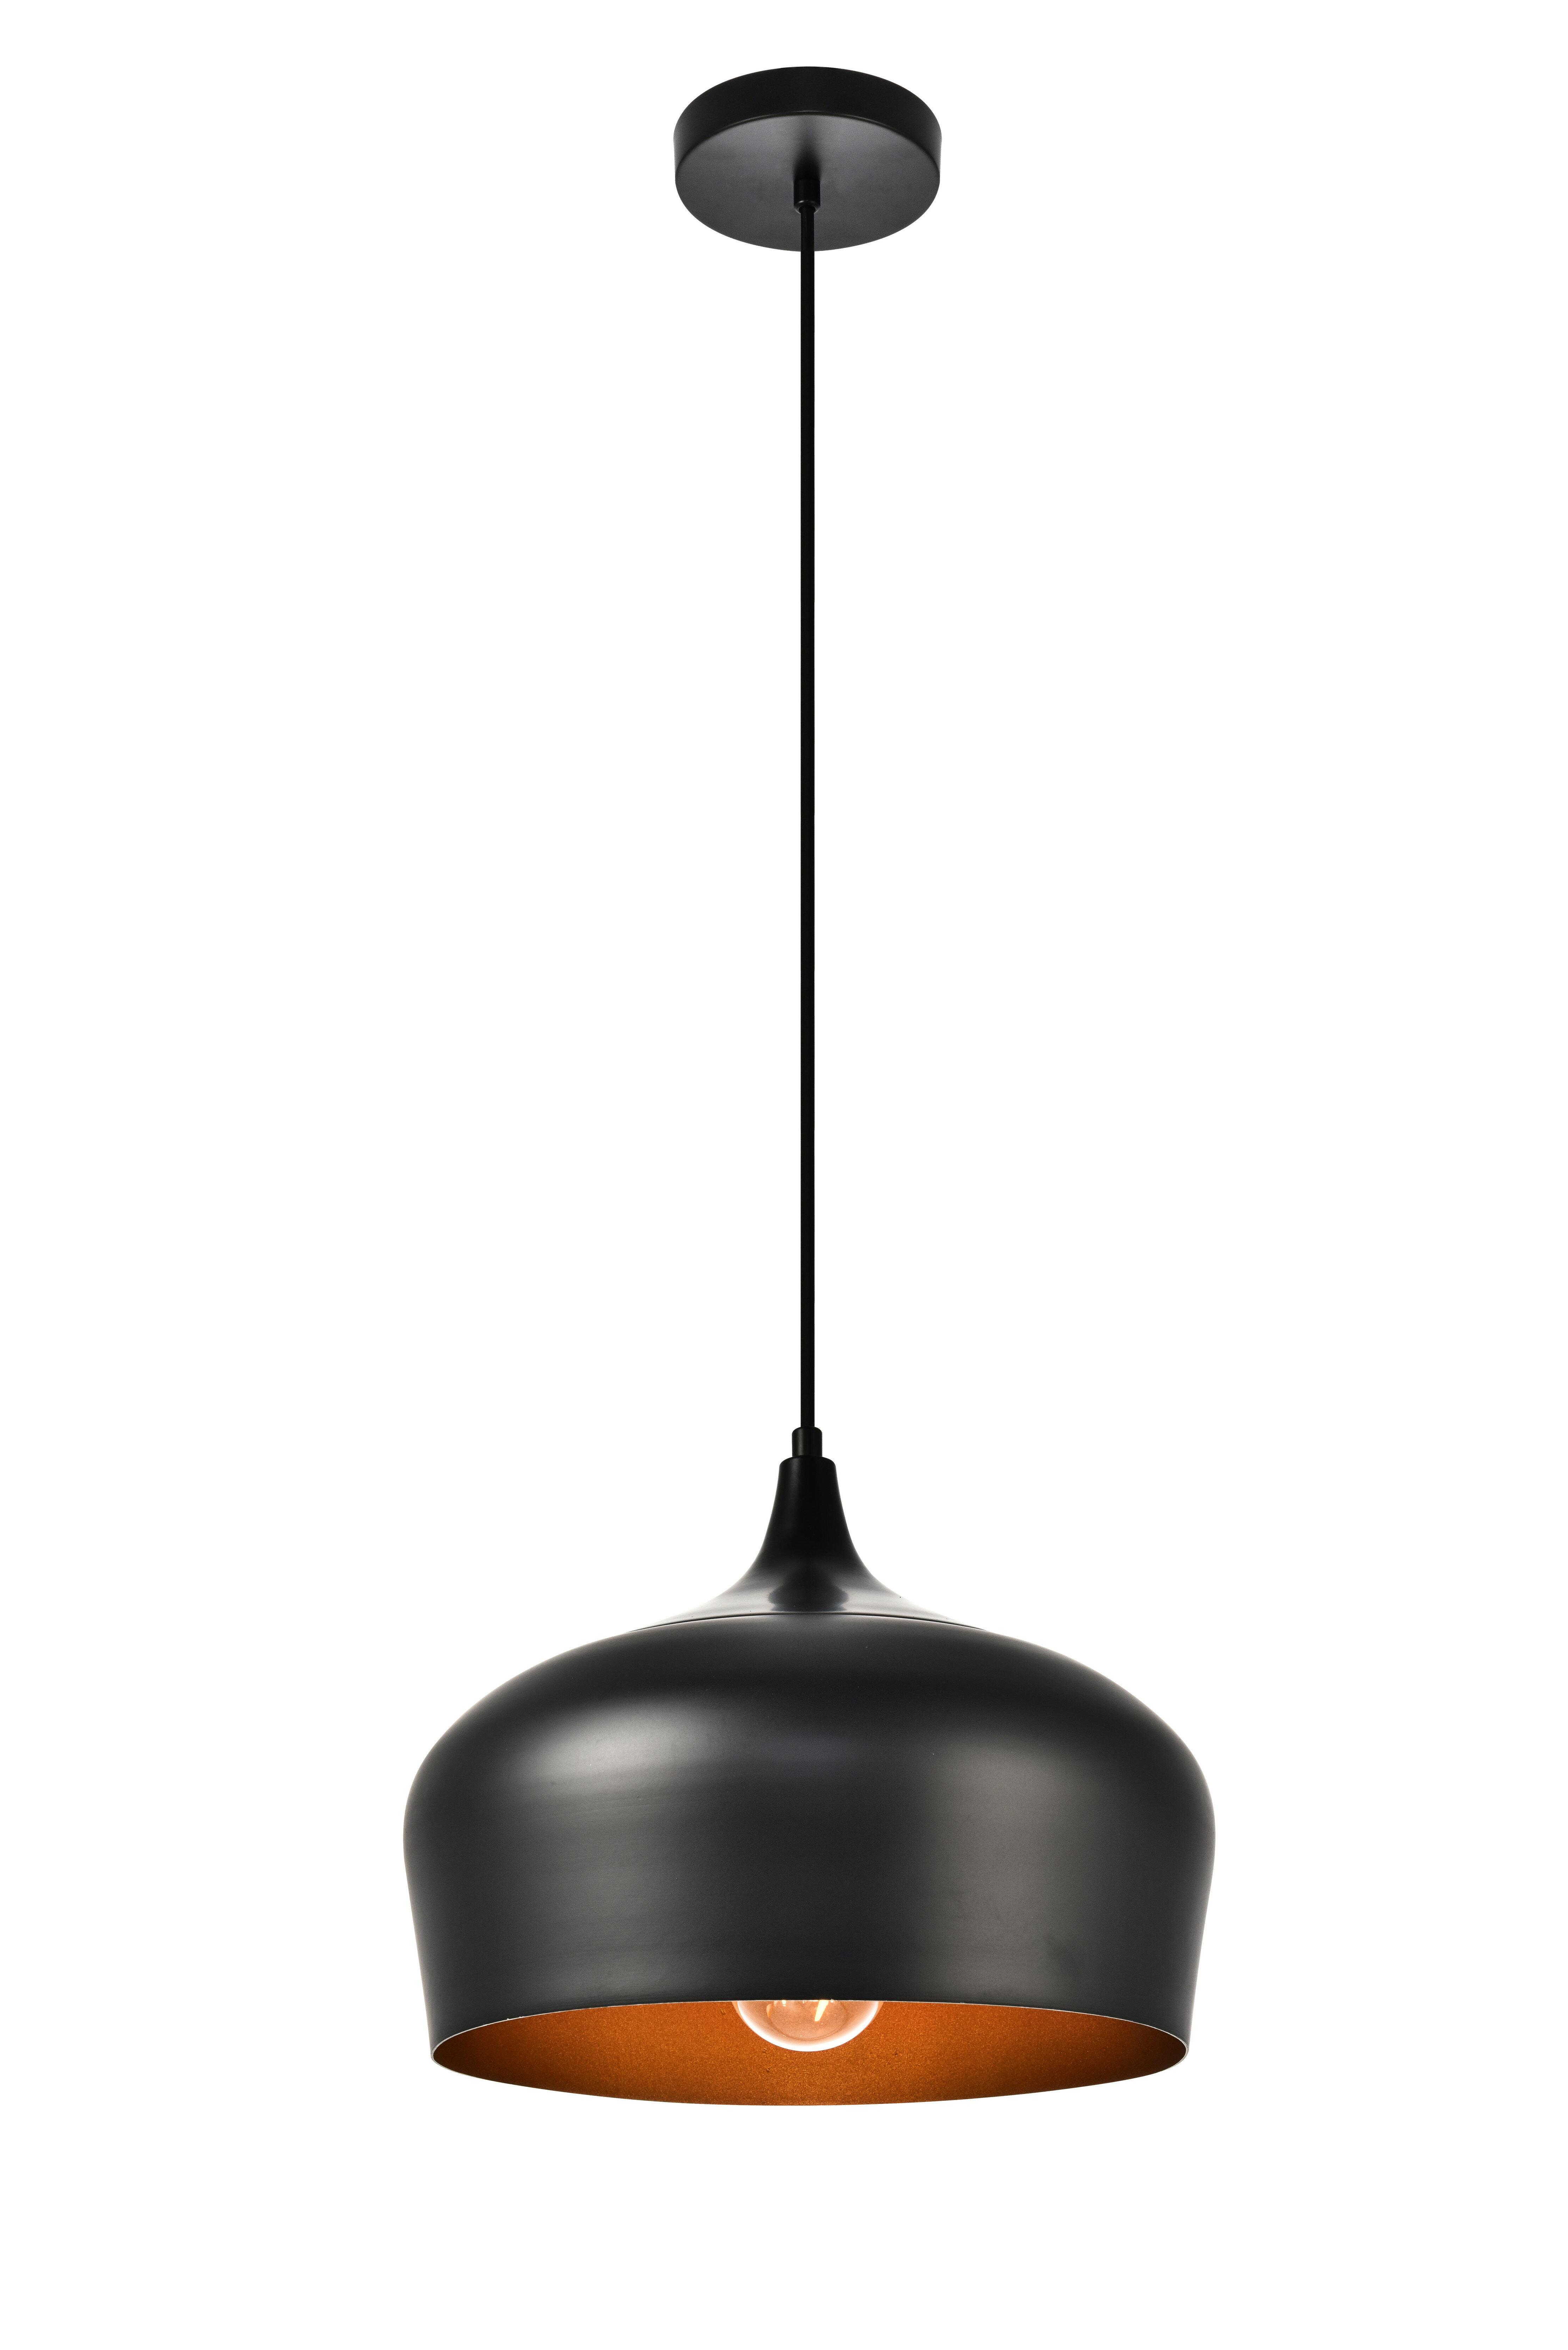 Jordan 1-Light Single Teardrop Pendant in Southlake 1-Light Single Dome Pendants (Image 17 of 30)